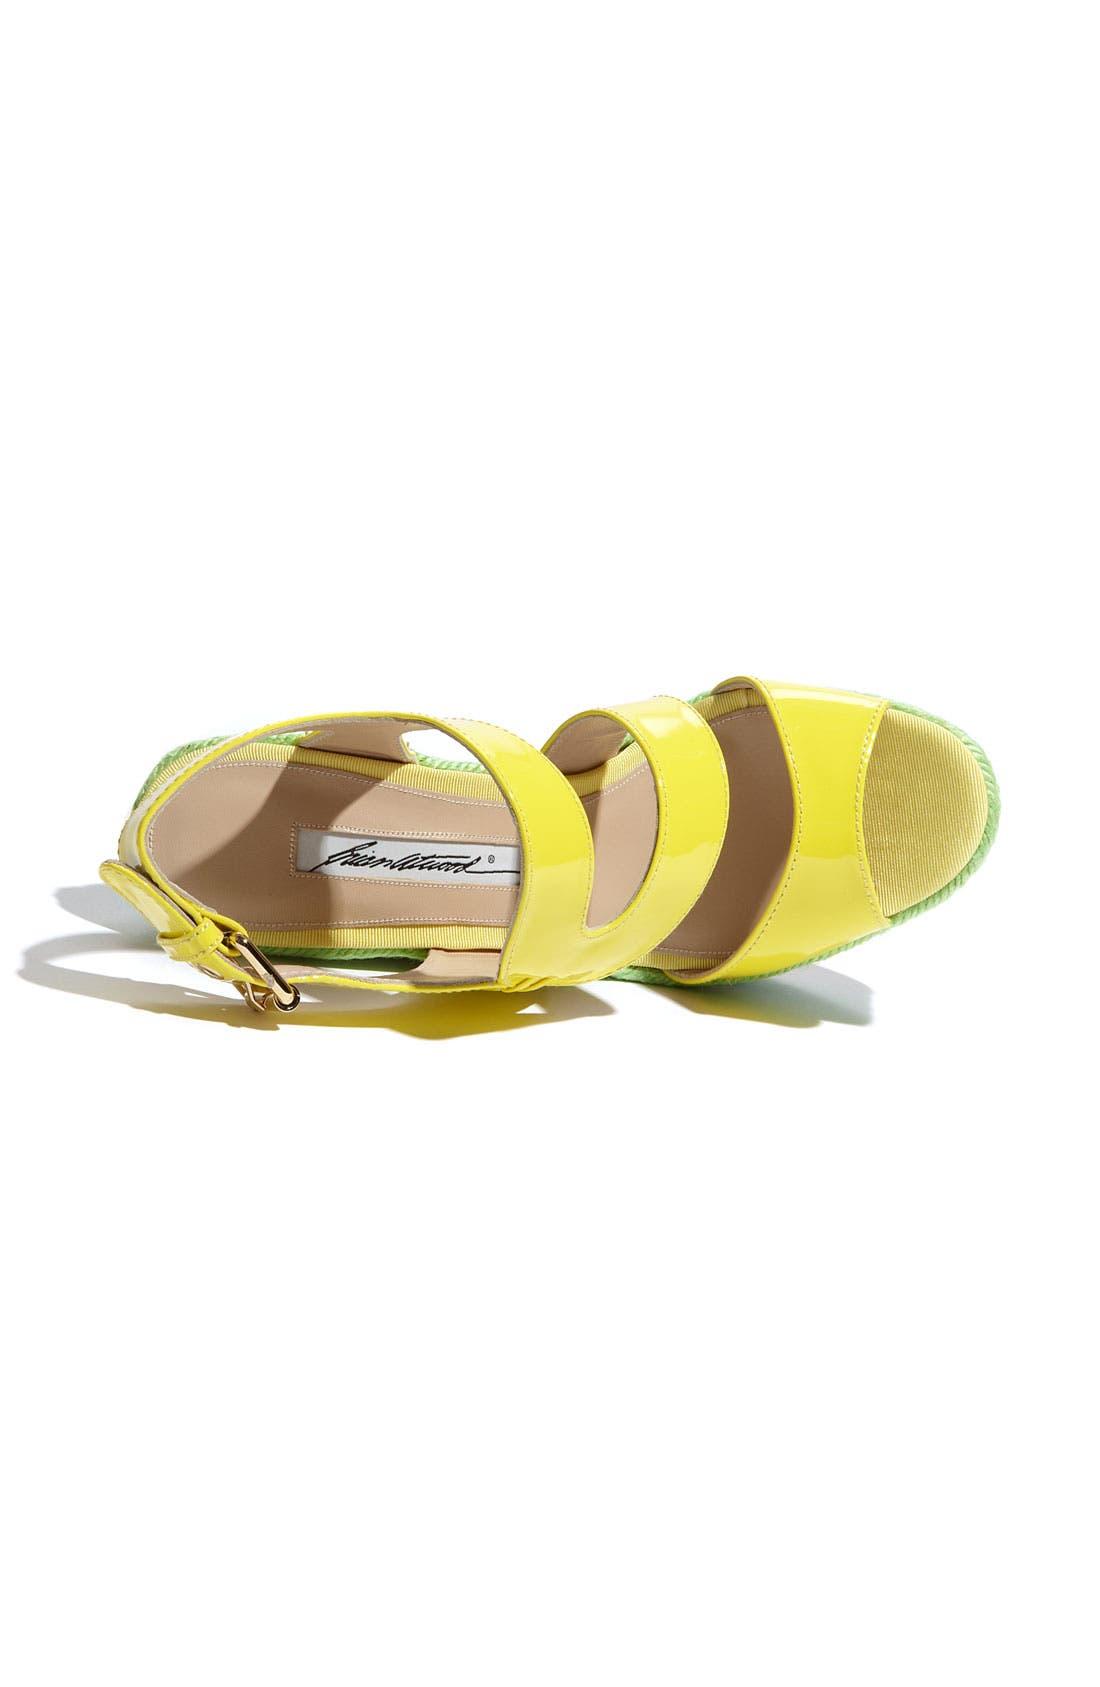 'Ariane' Espadrille Wedge Sandal,                             Alternate thumbnail 3, color,